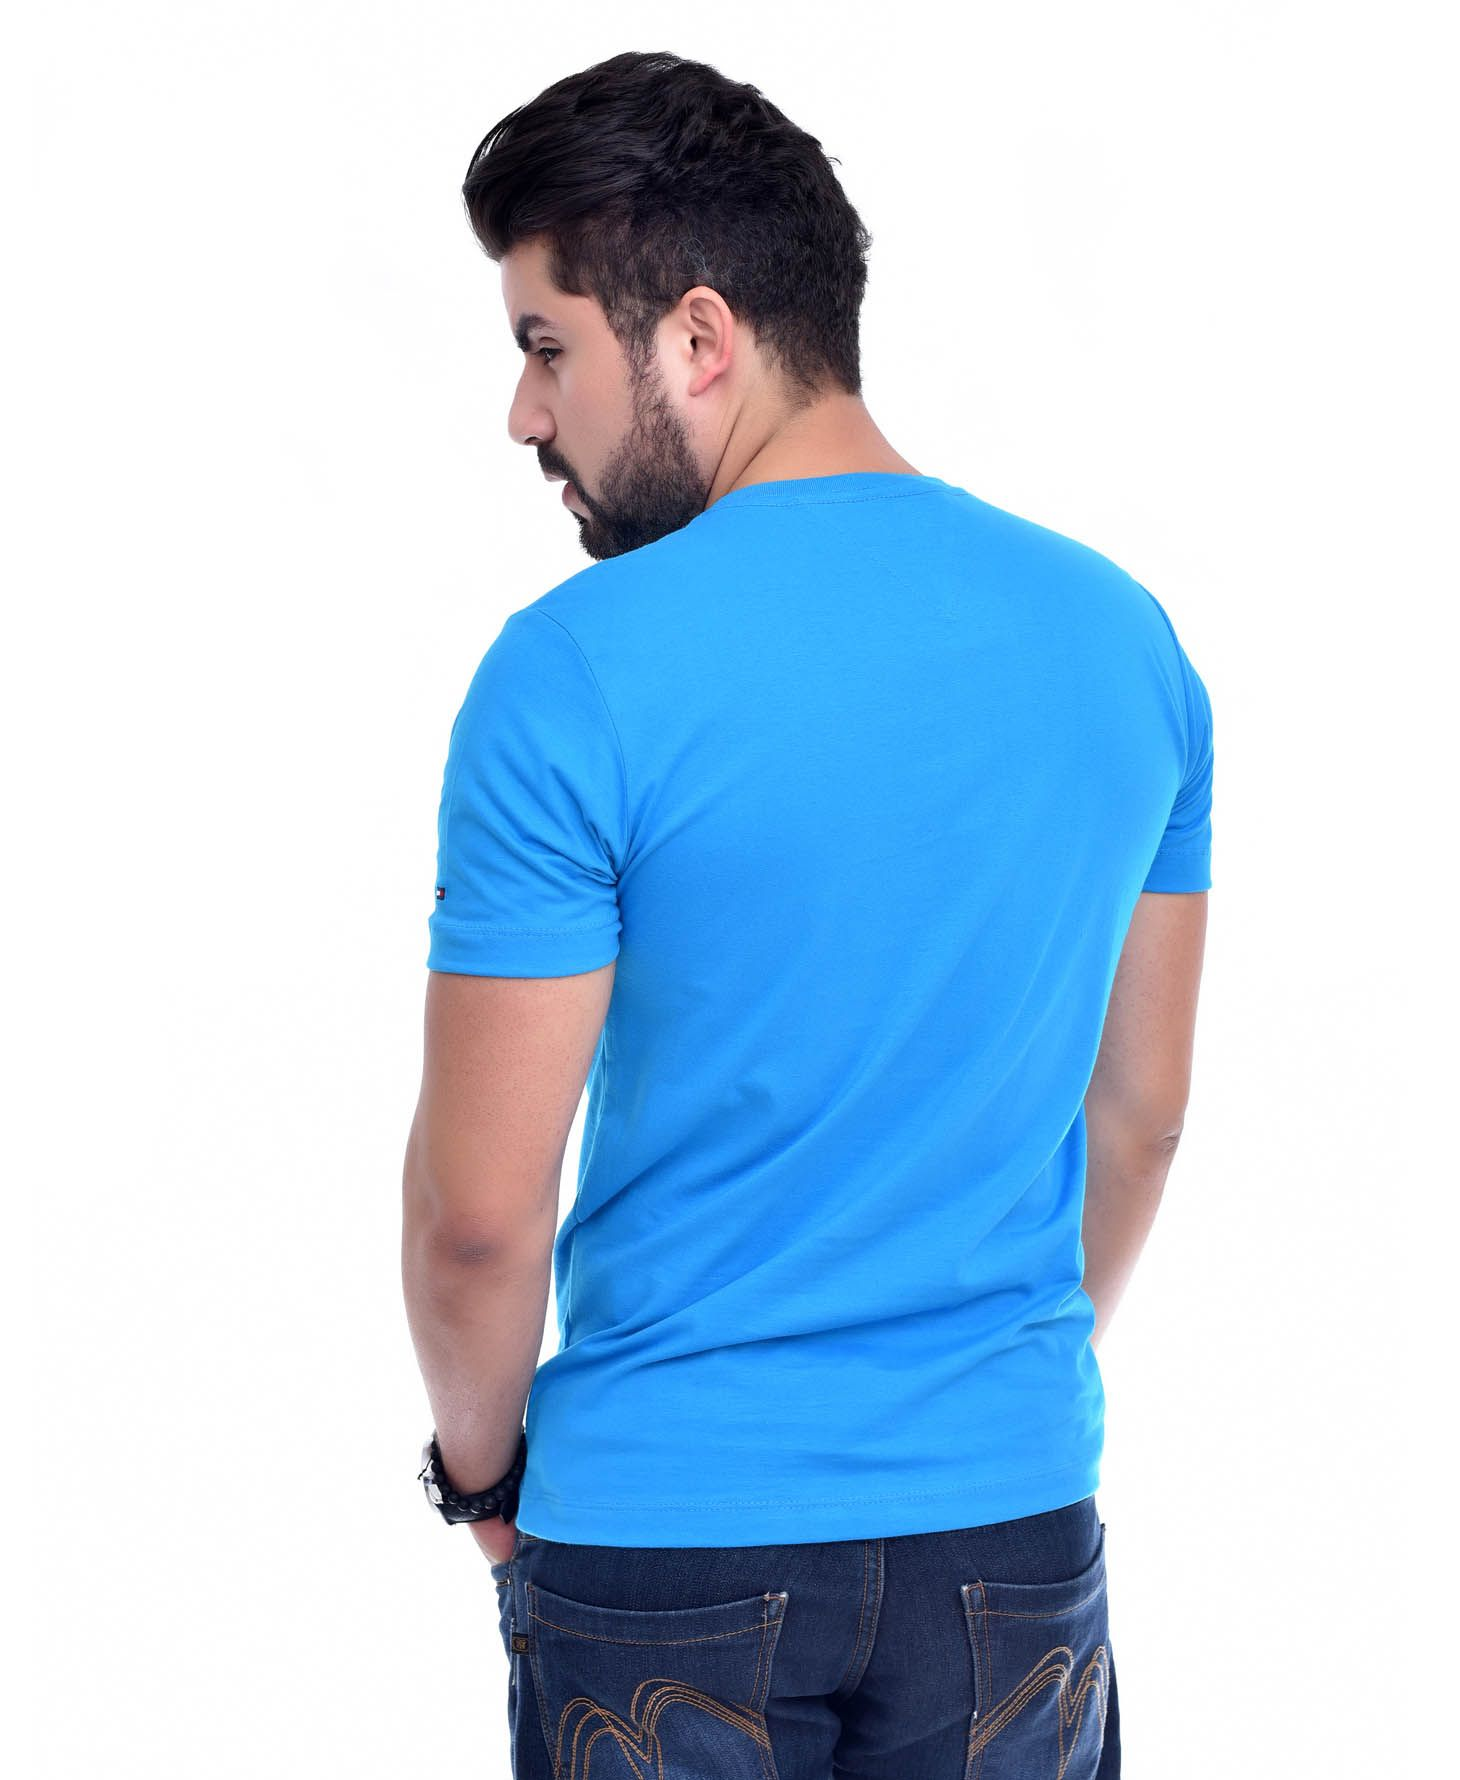 Camiseta Bolso TH Turquesa/TRQ  - Ca Brasileira